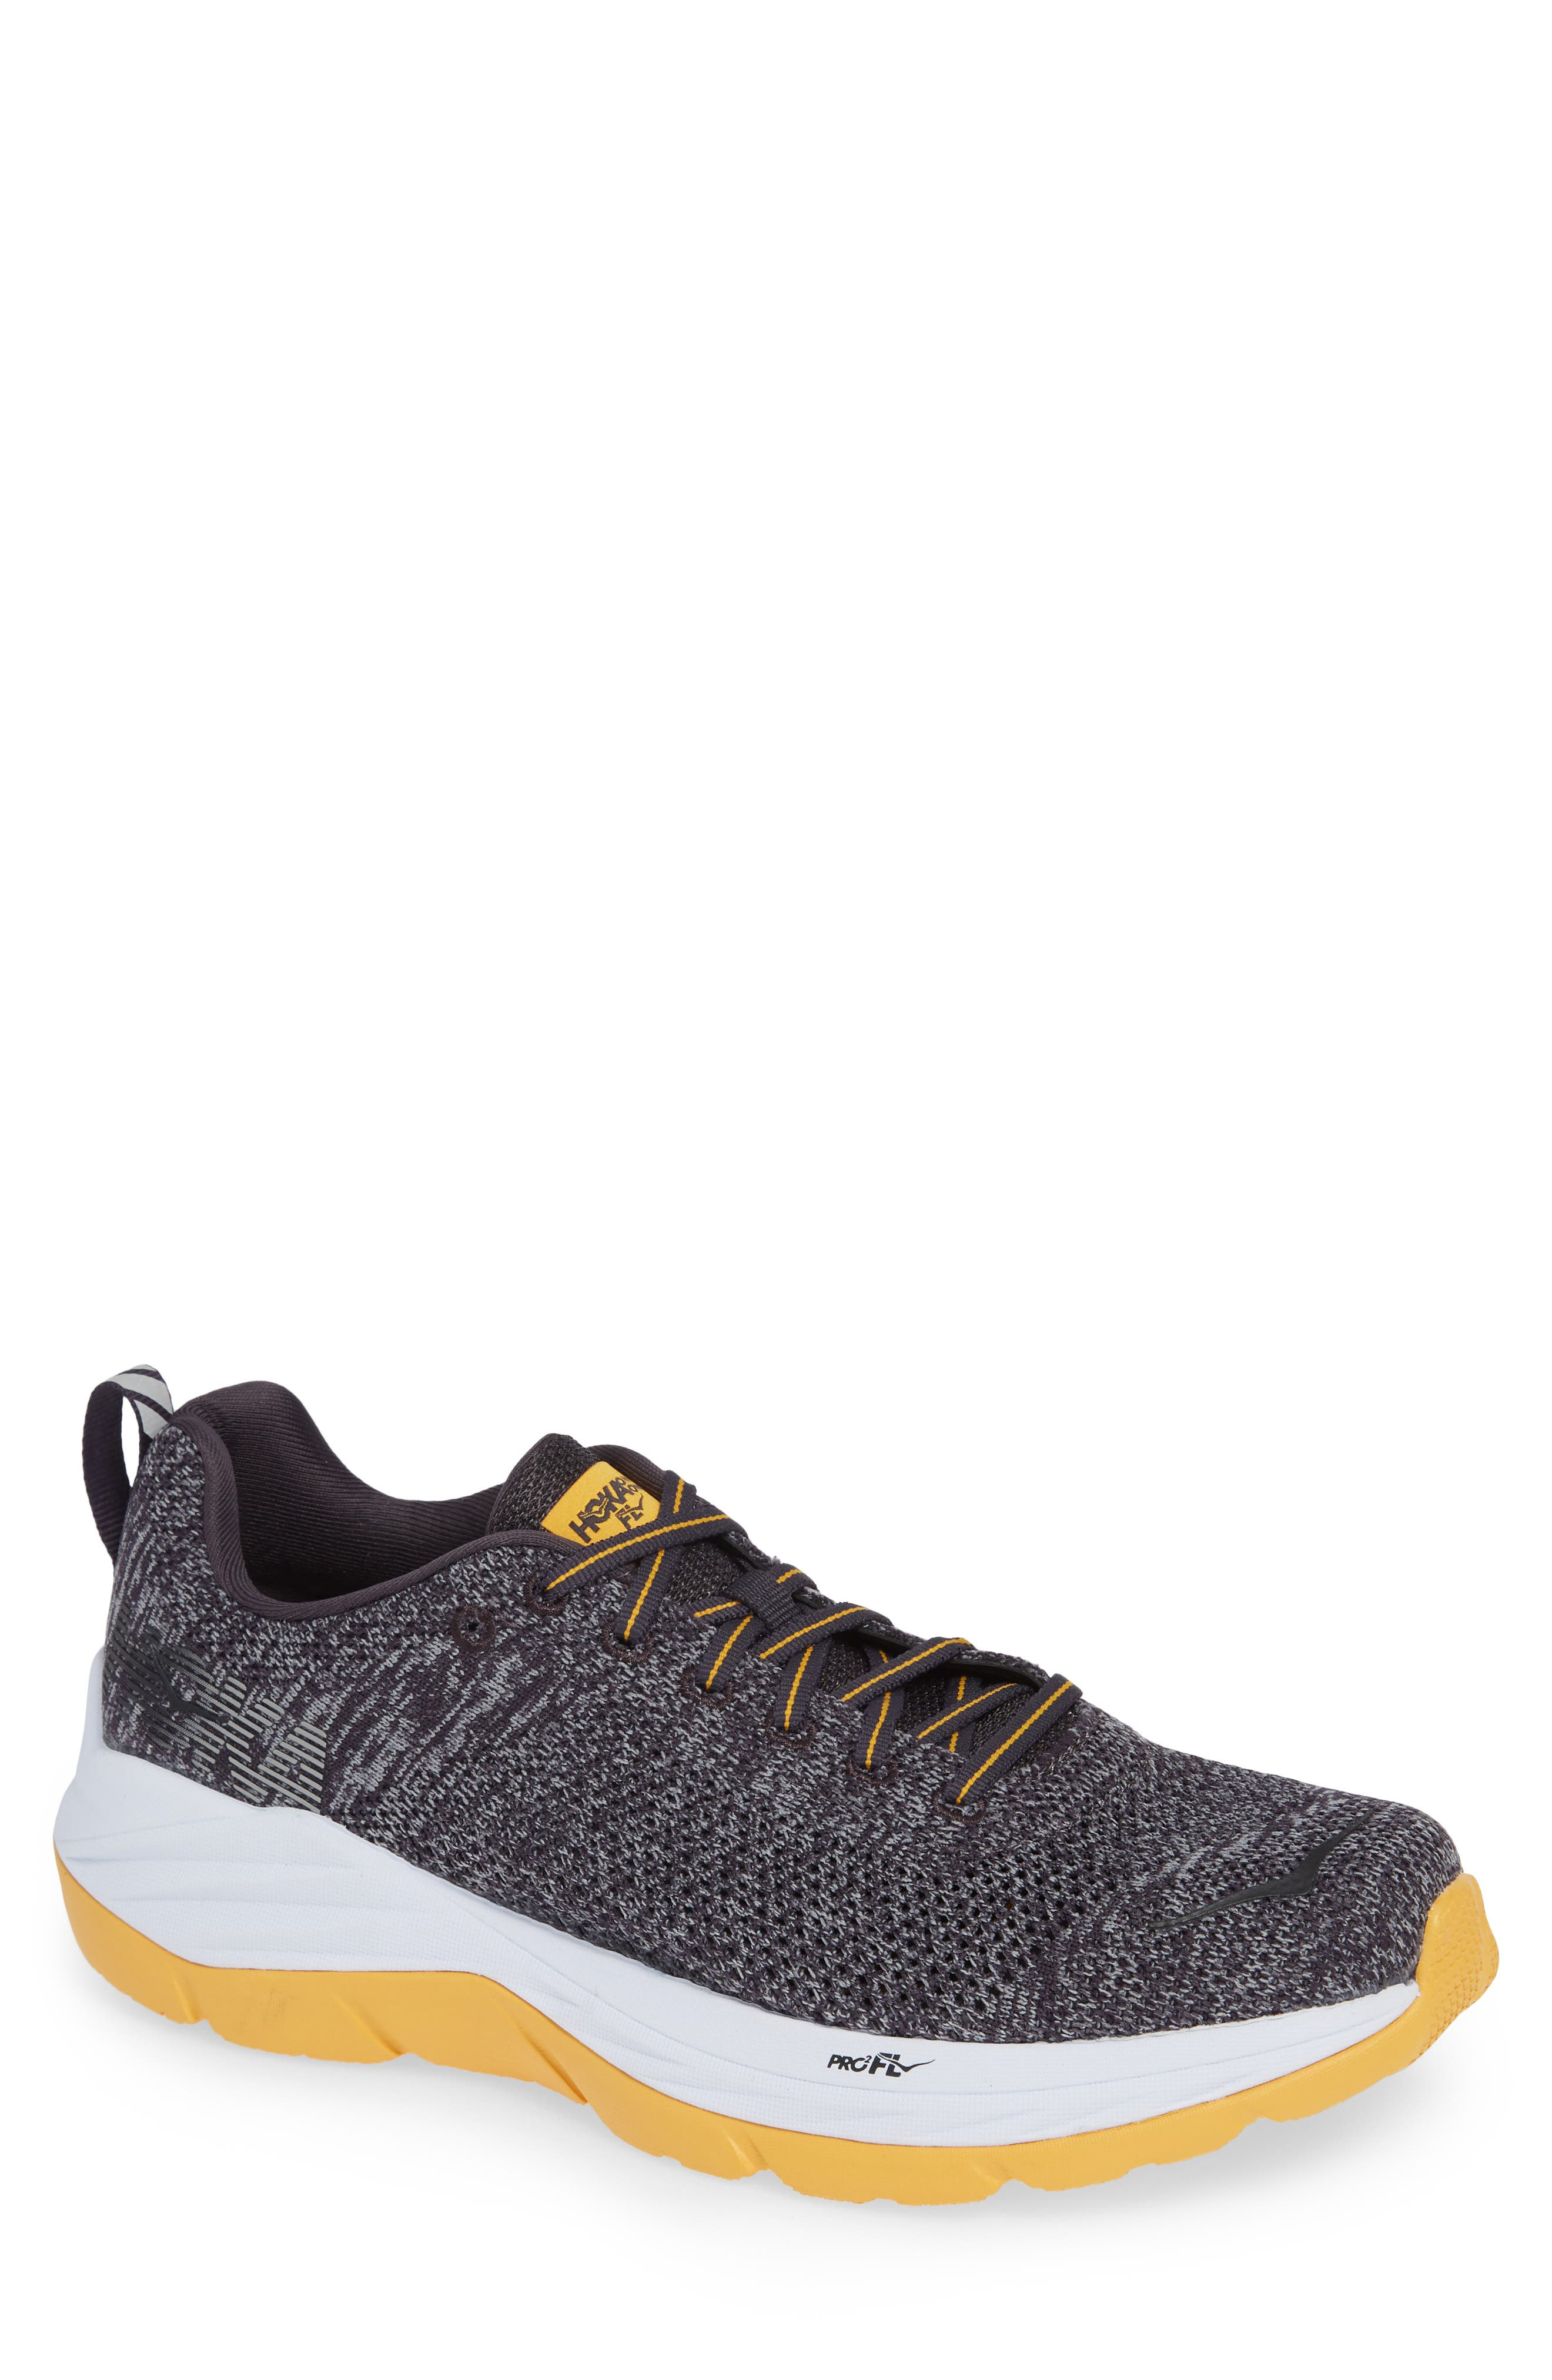 Hoka One One Mach Running Shoe, Grey